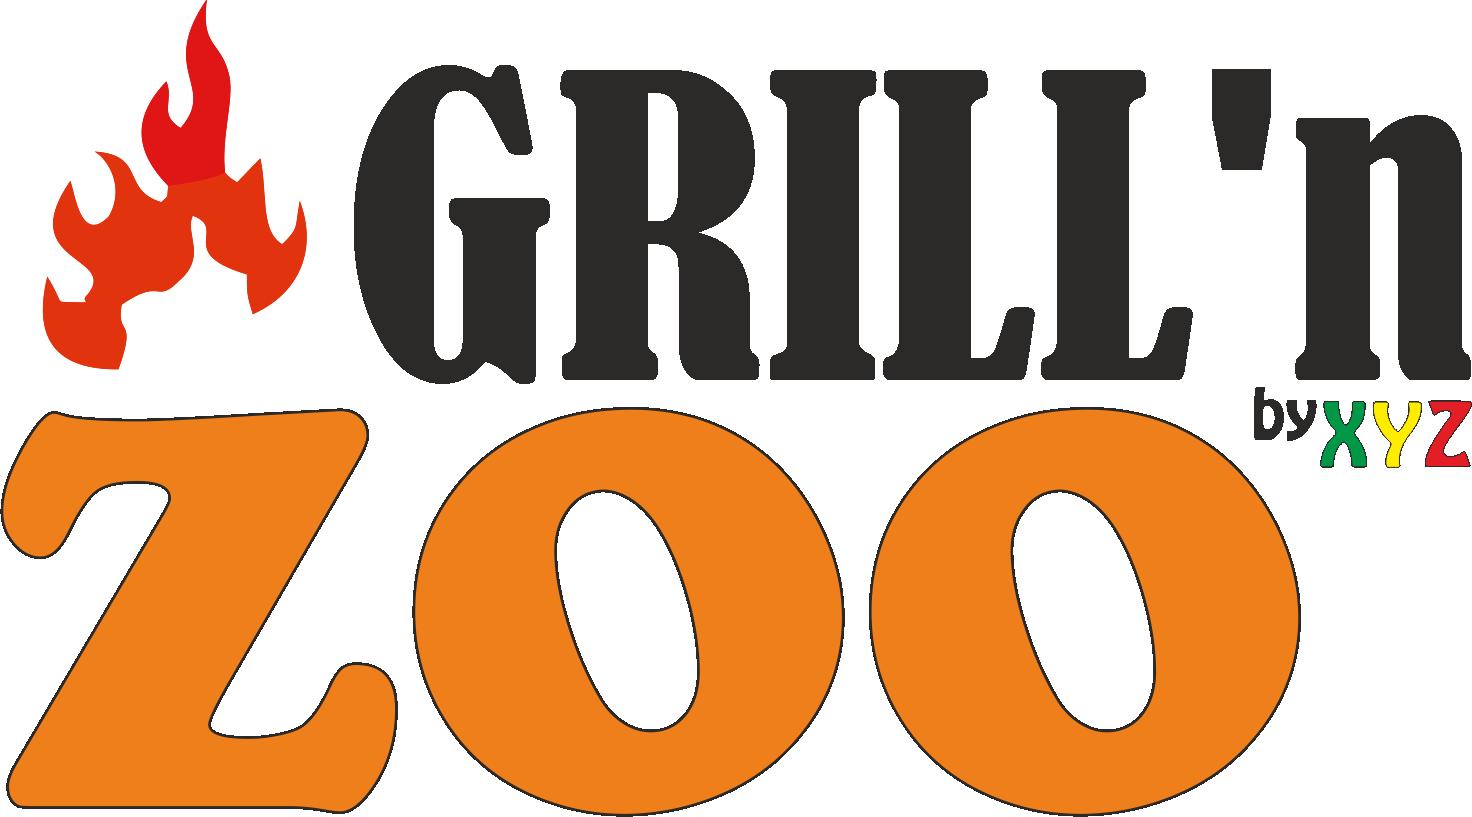 Grill'n Zoo